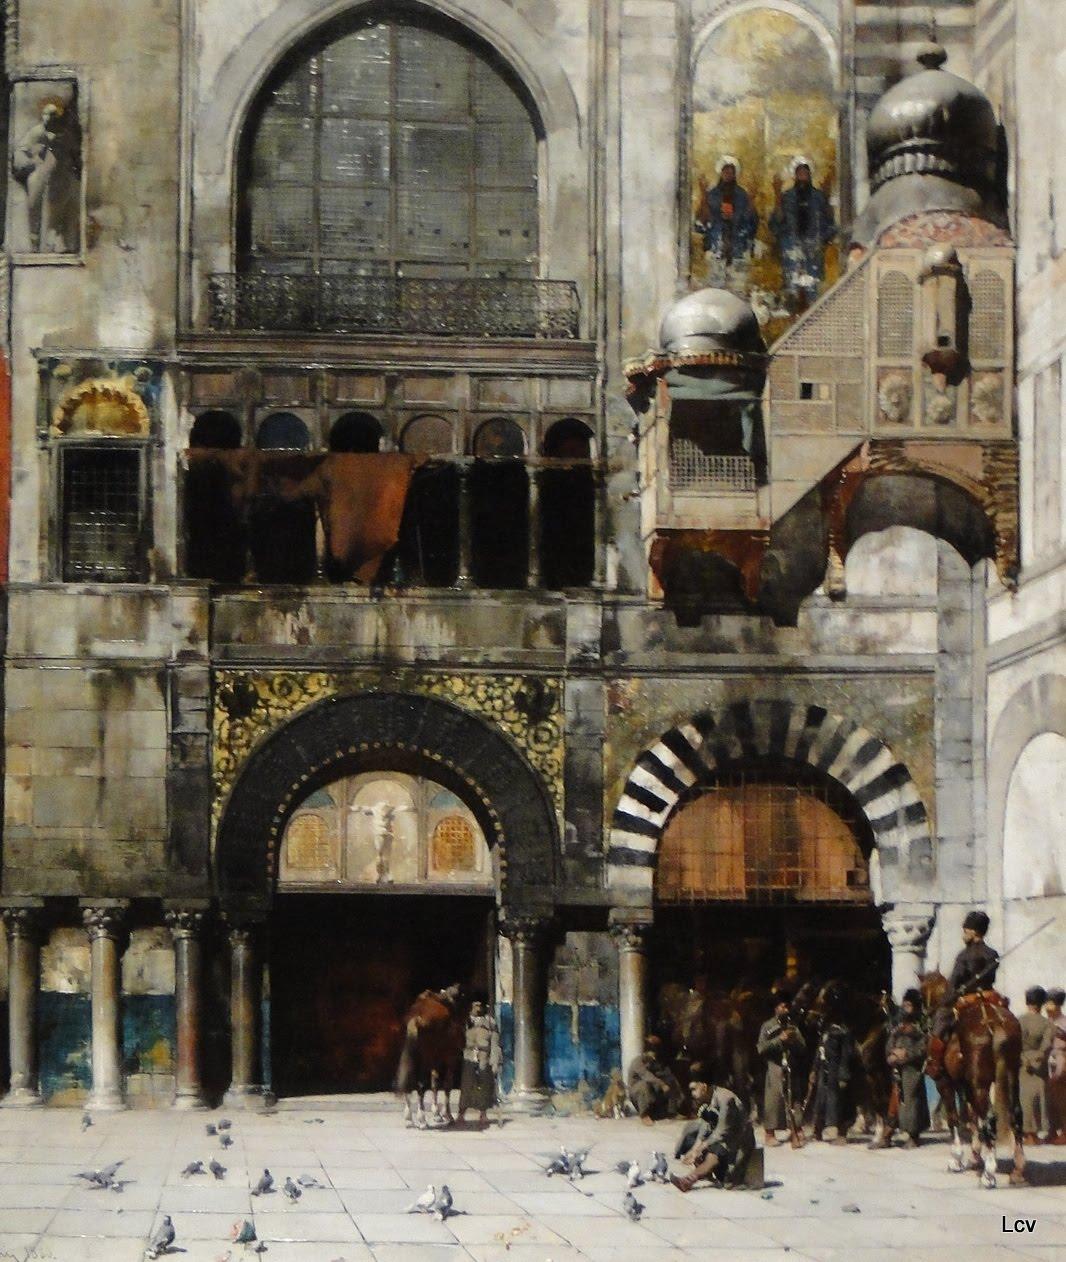 circassian cavalry awaiting their commanding officer Pasini